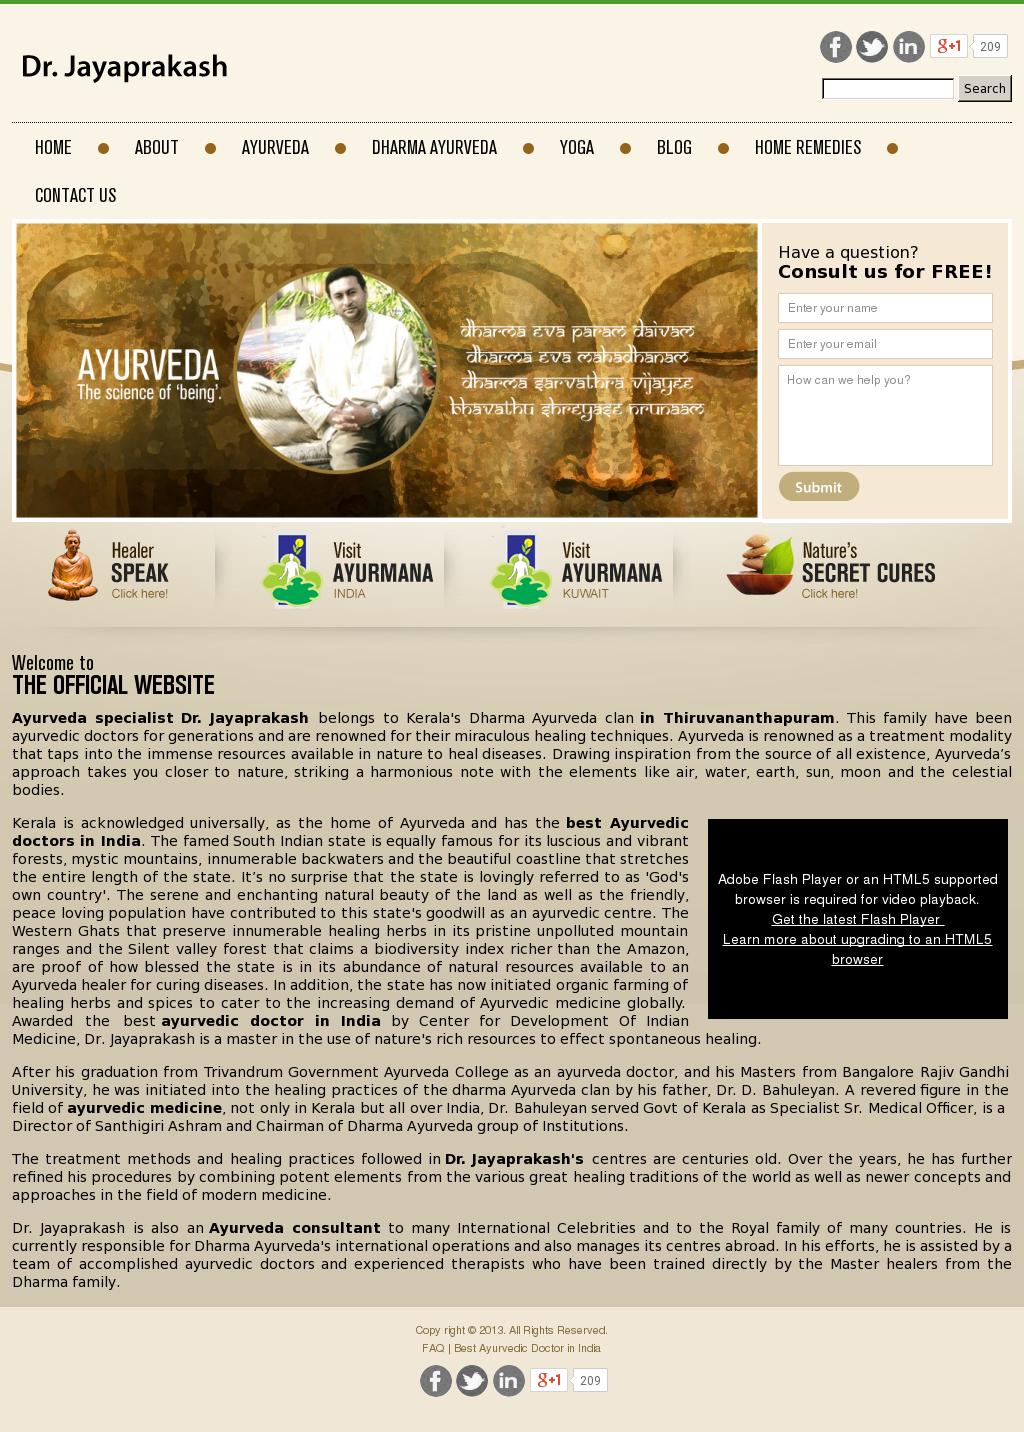 Ayurveda Doctor - Dr jayaprakash Competitors, Revenue and